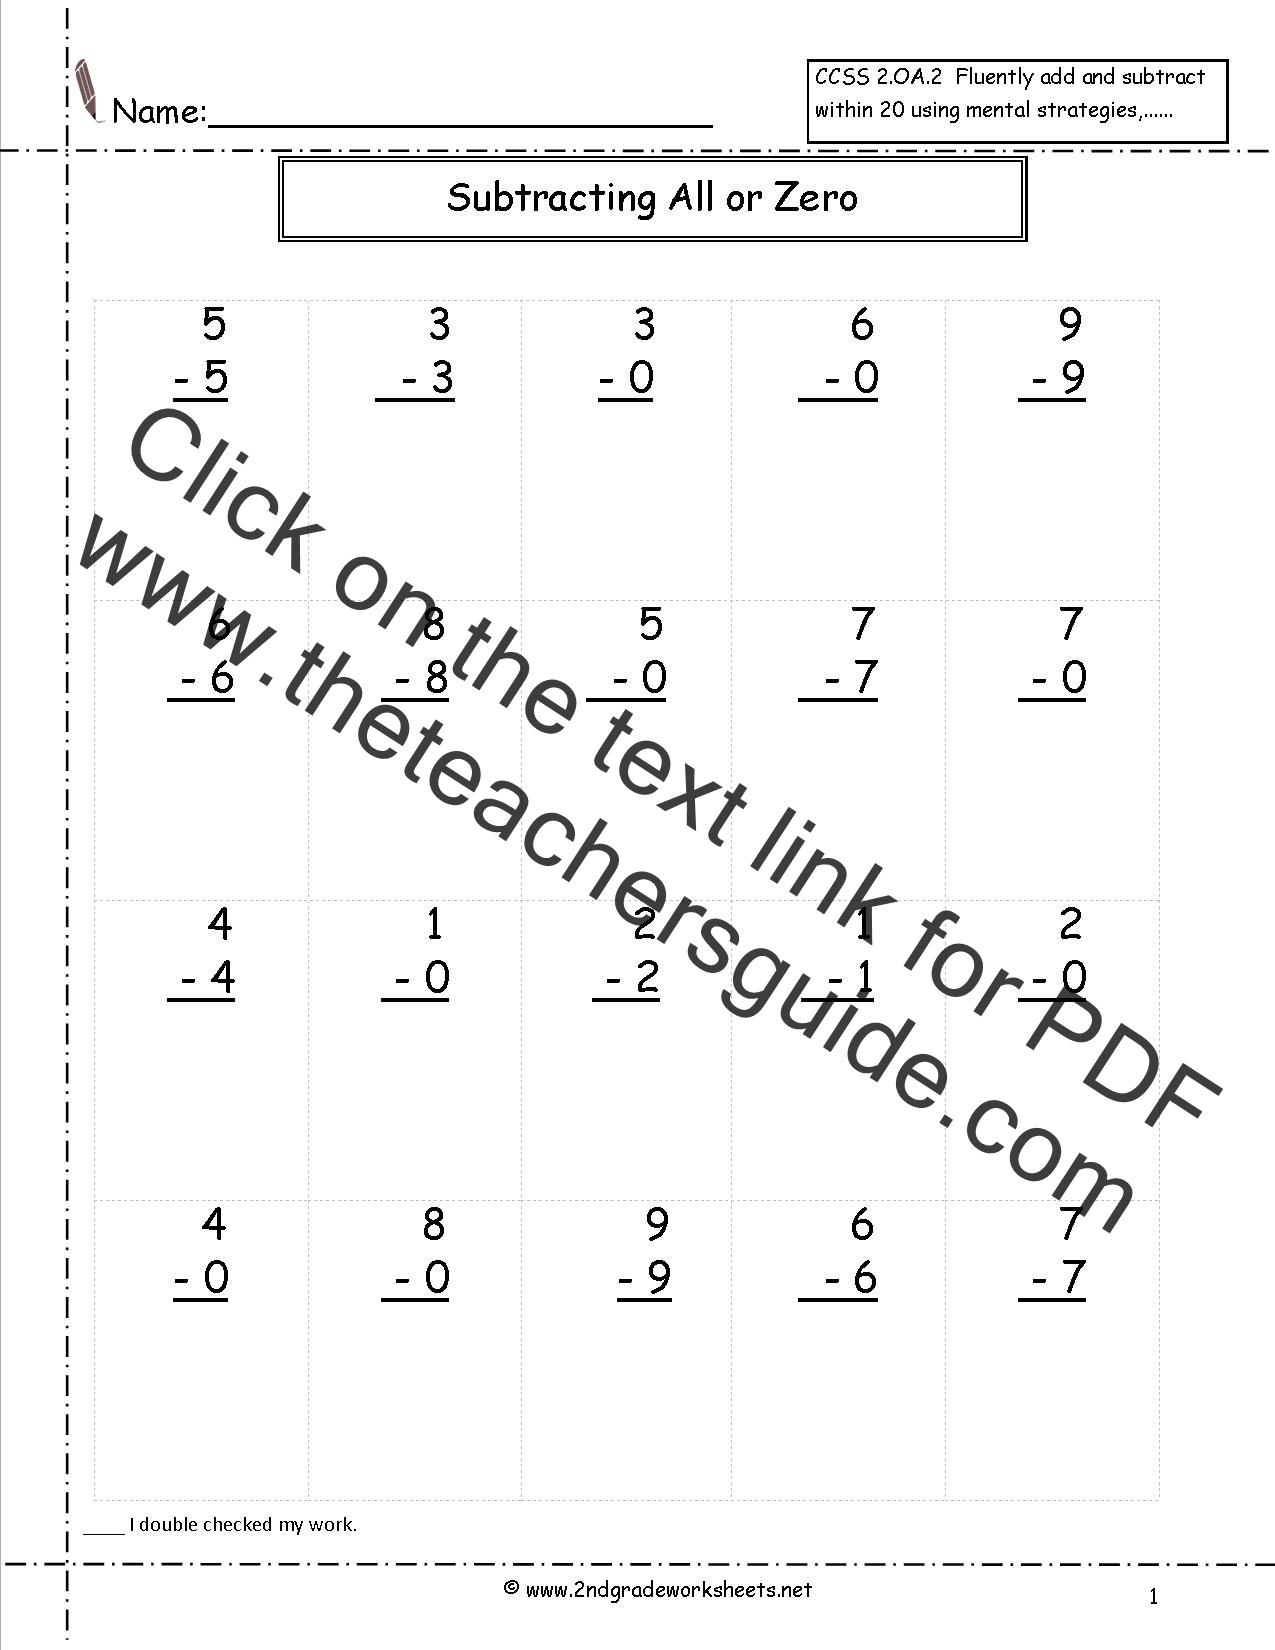 Single Digit Subtraction Fluency Worksheets